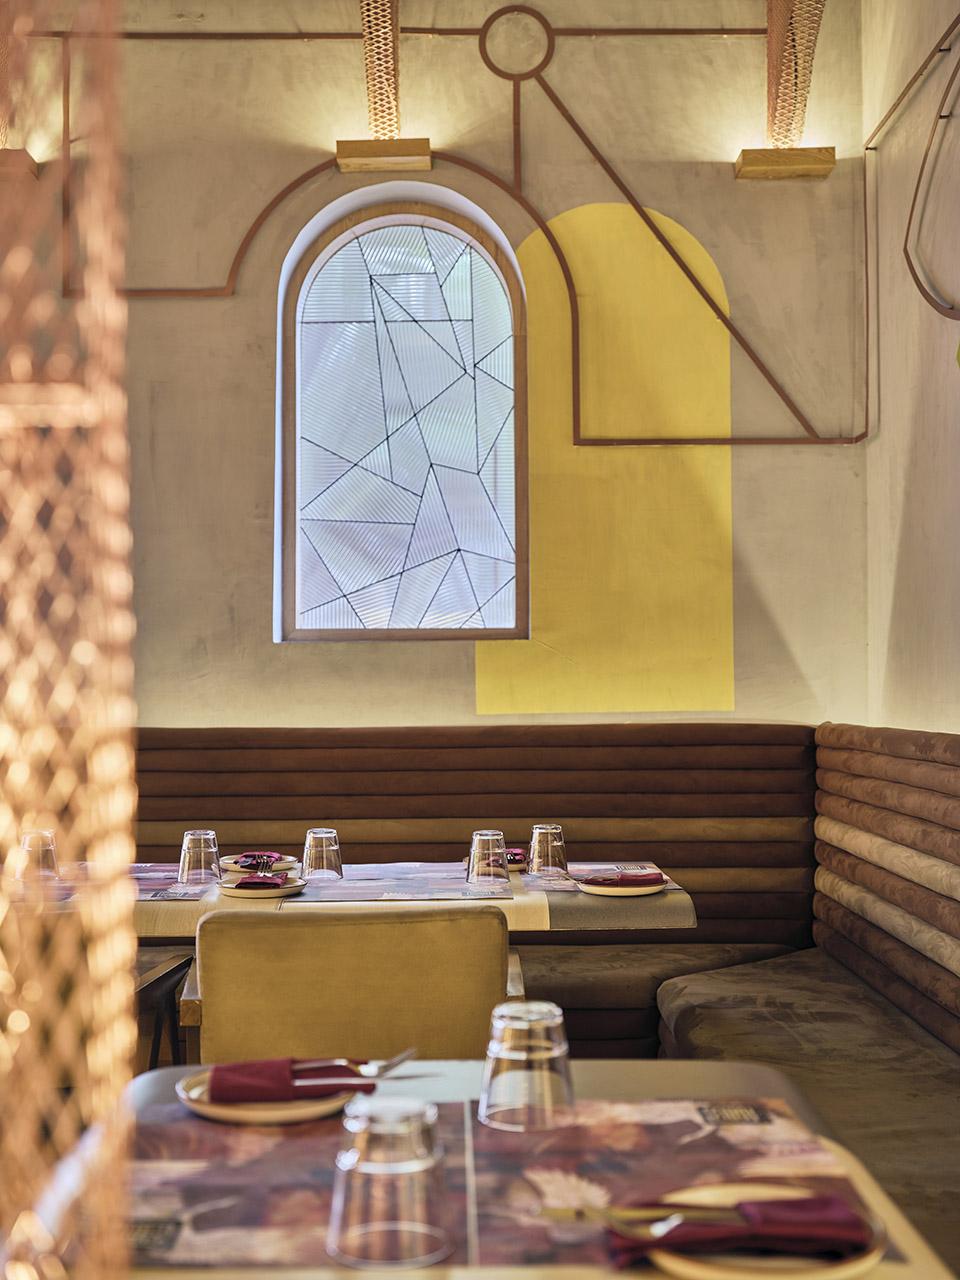 009-misu-restaurant-by-fadd-studio.jpg